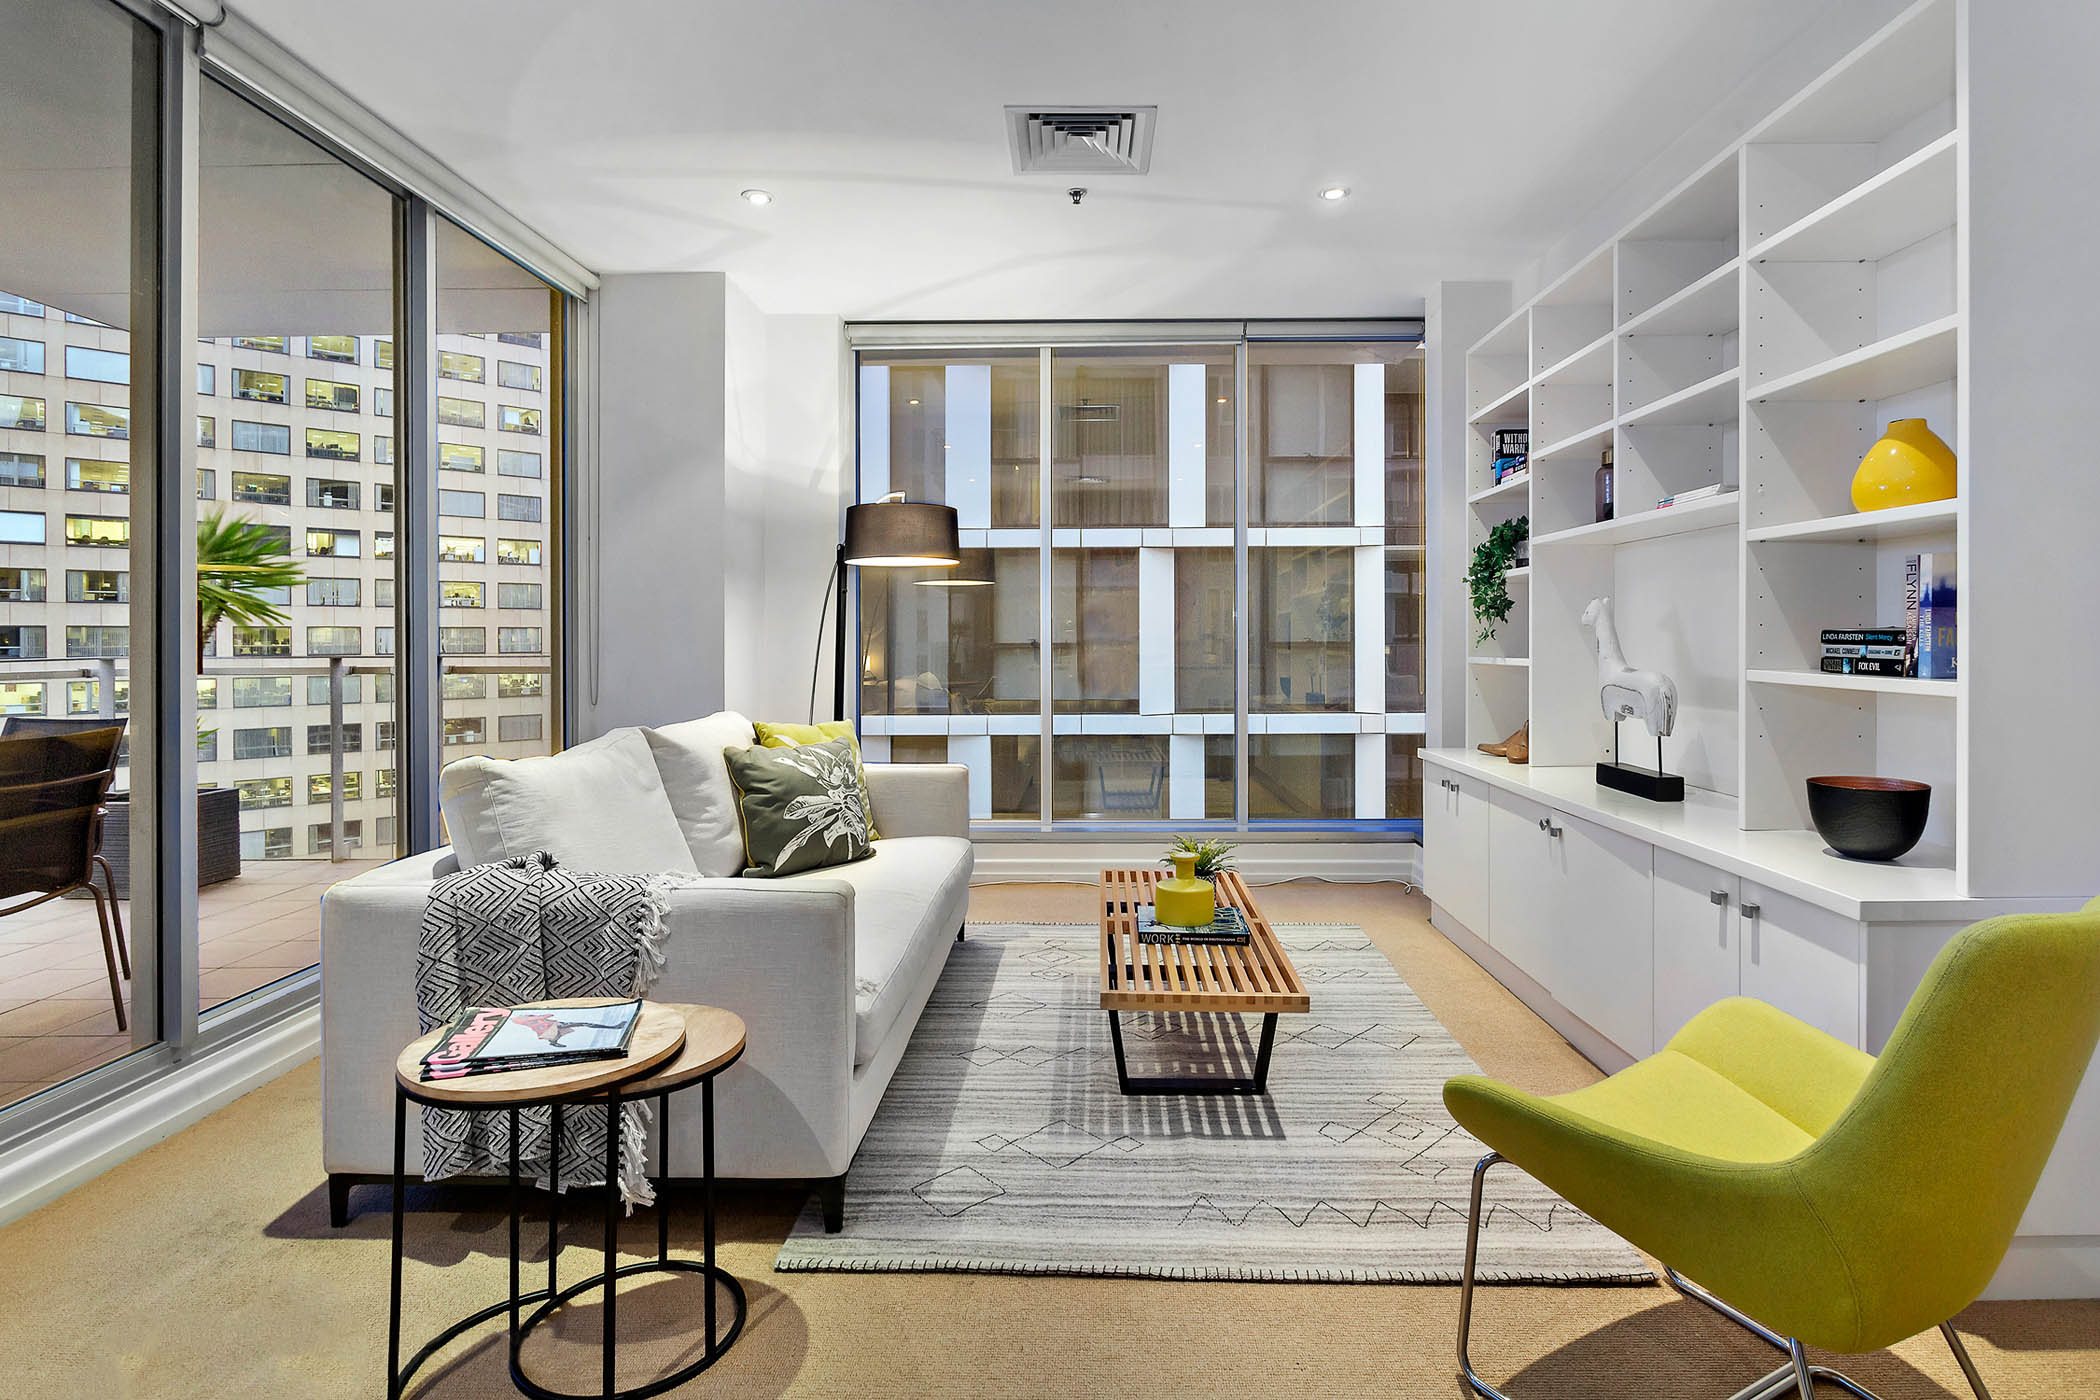 1804-31-spring-street-melbourne-student-accommodation-Melbourne-Living-Area-Unilodgers